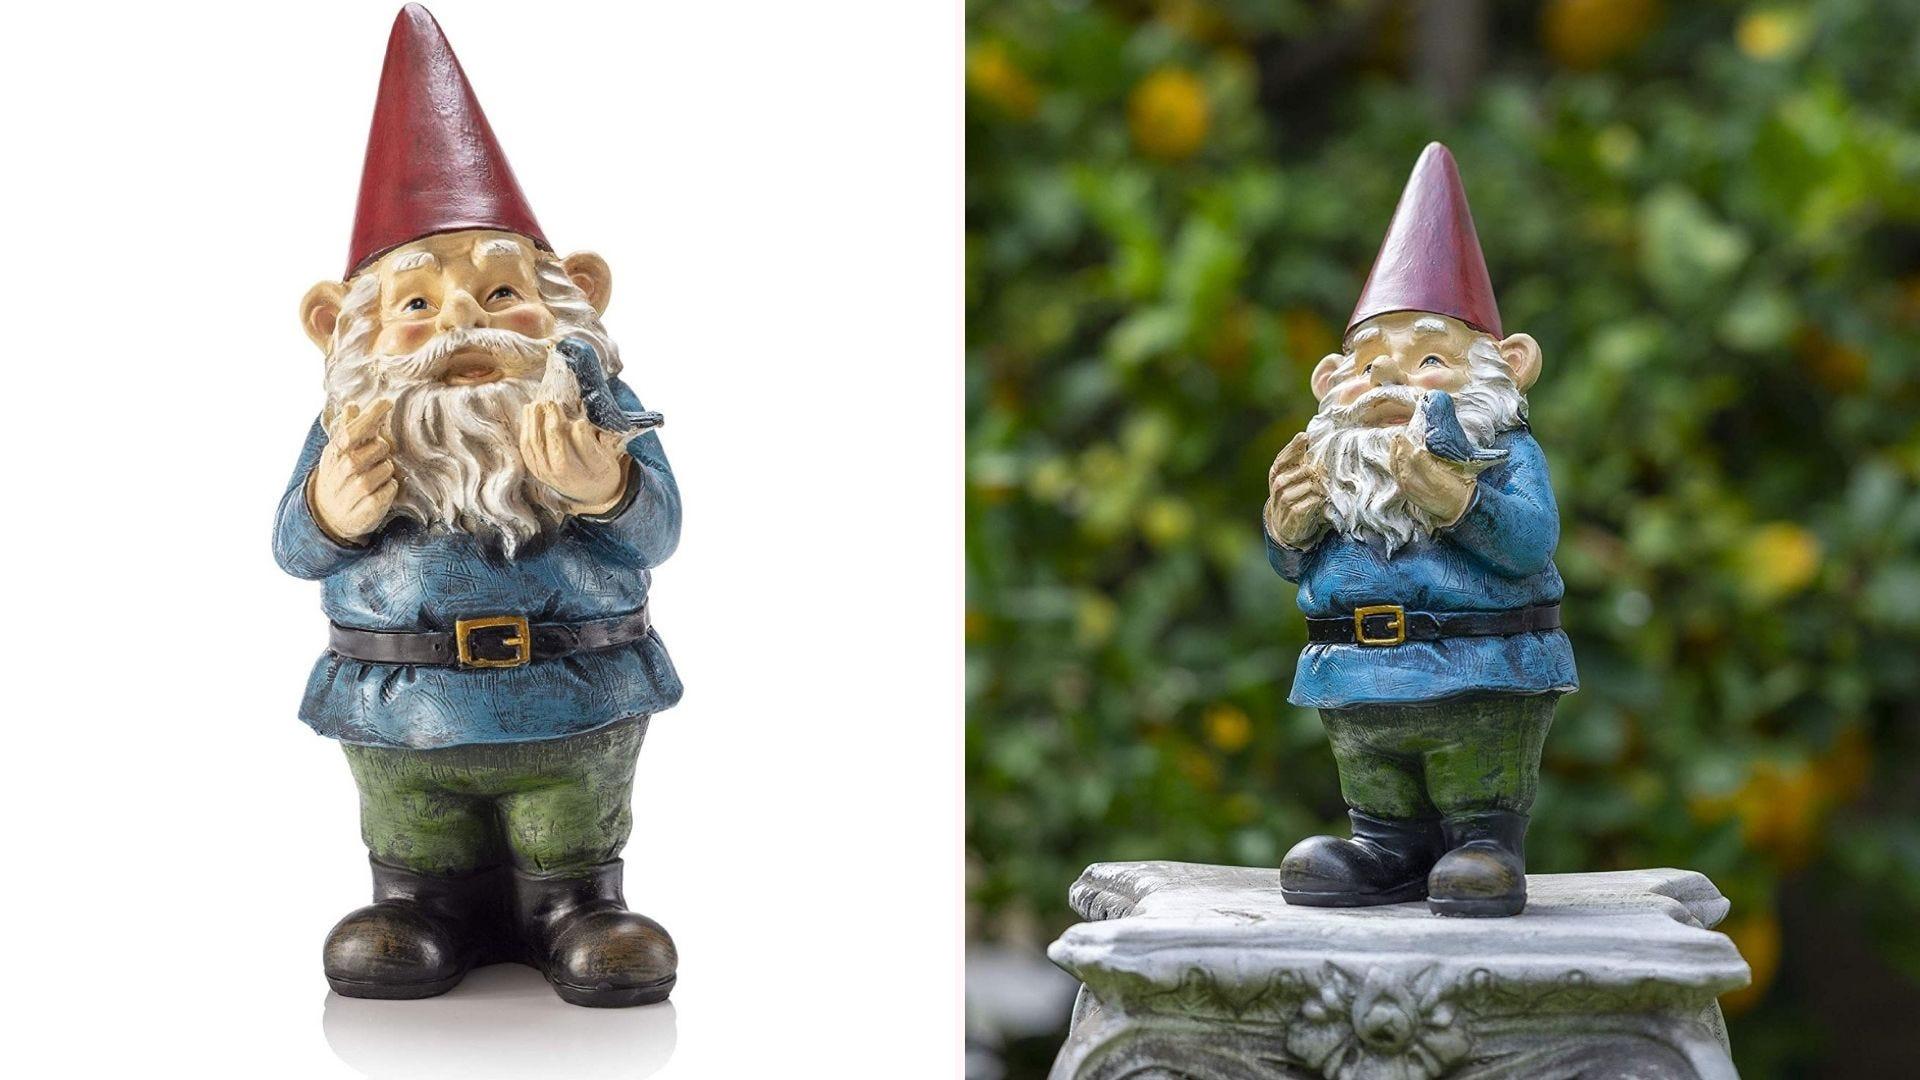 Garden gnome holding a bird statue placed on a stone pillar